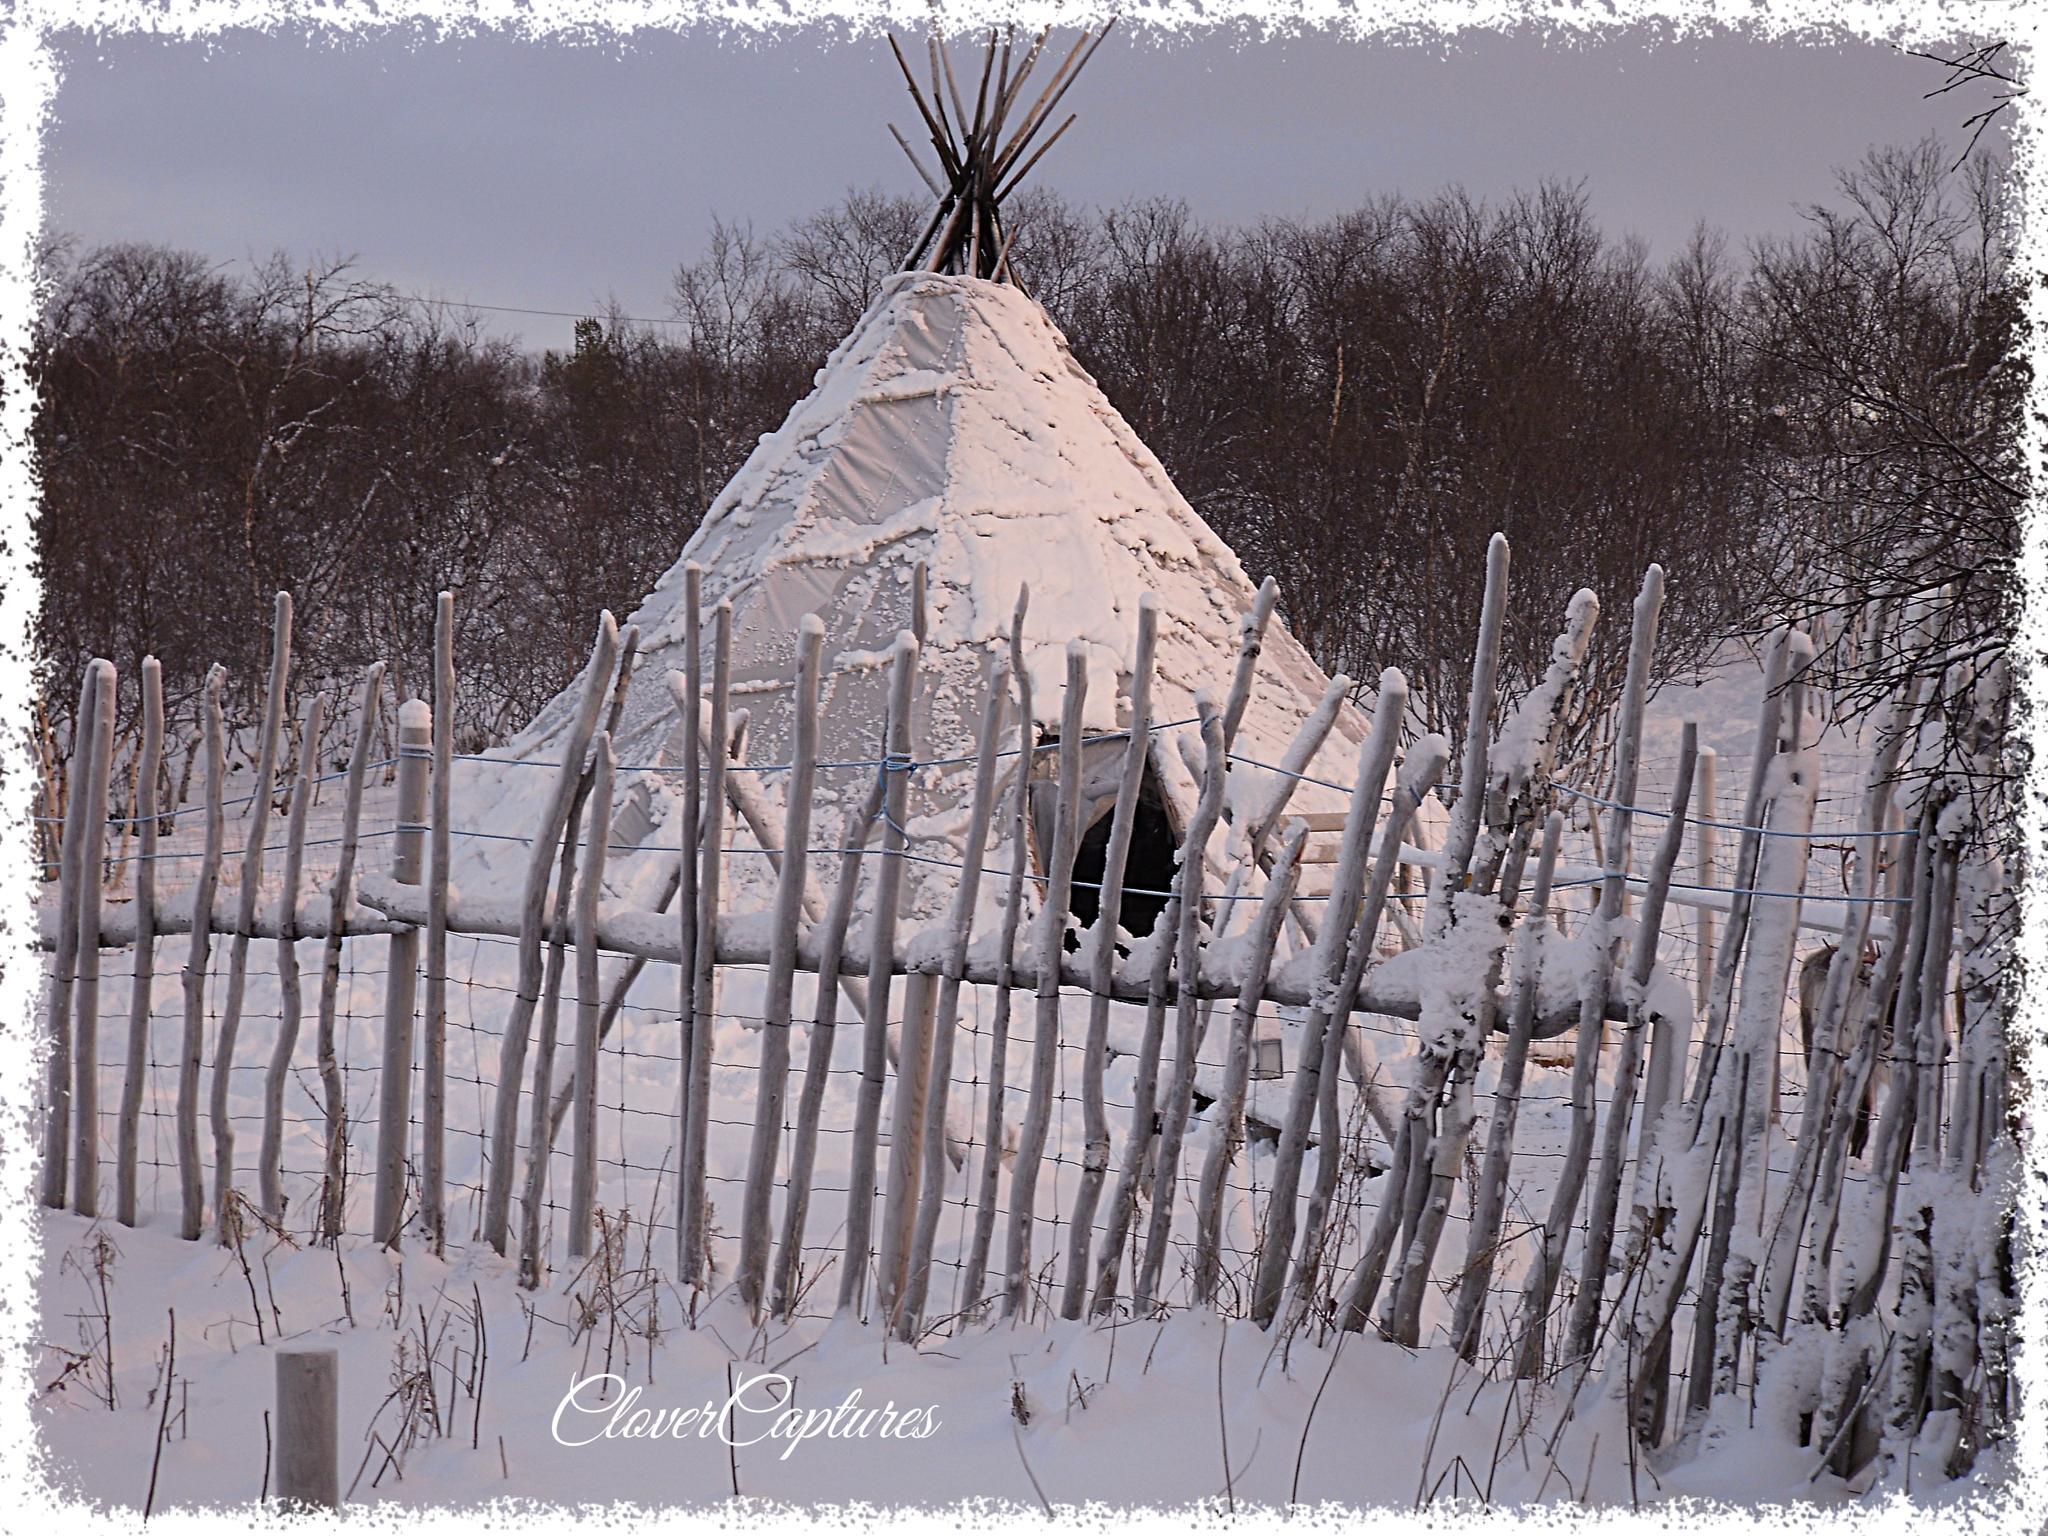 Sami Yurt by Yvonne Clover-Lambert